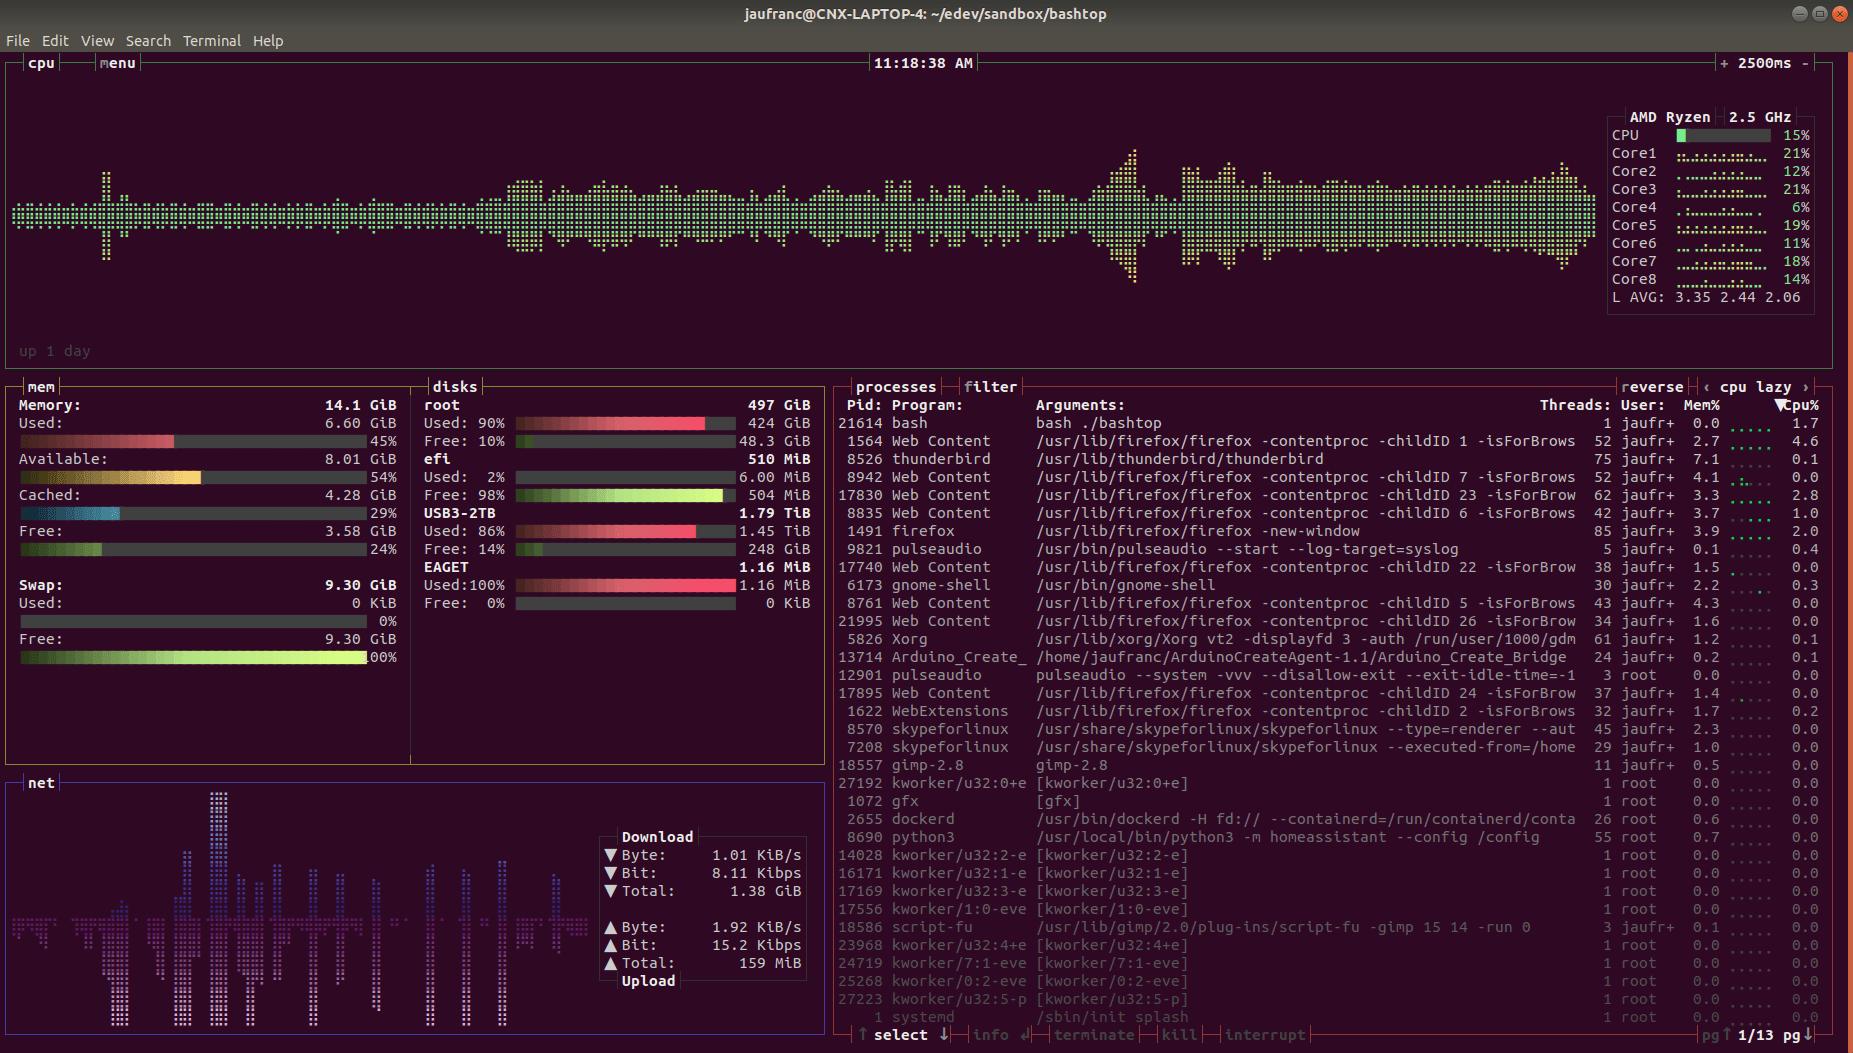 bashtop linux terminal monitor